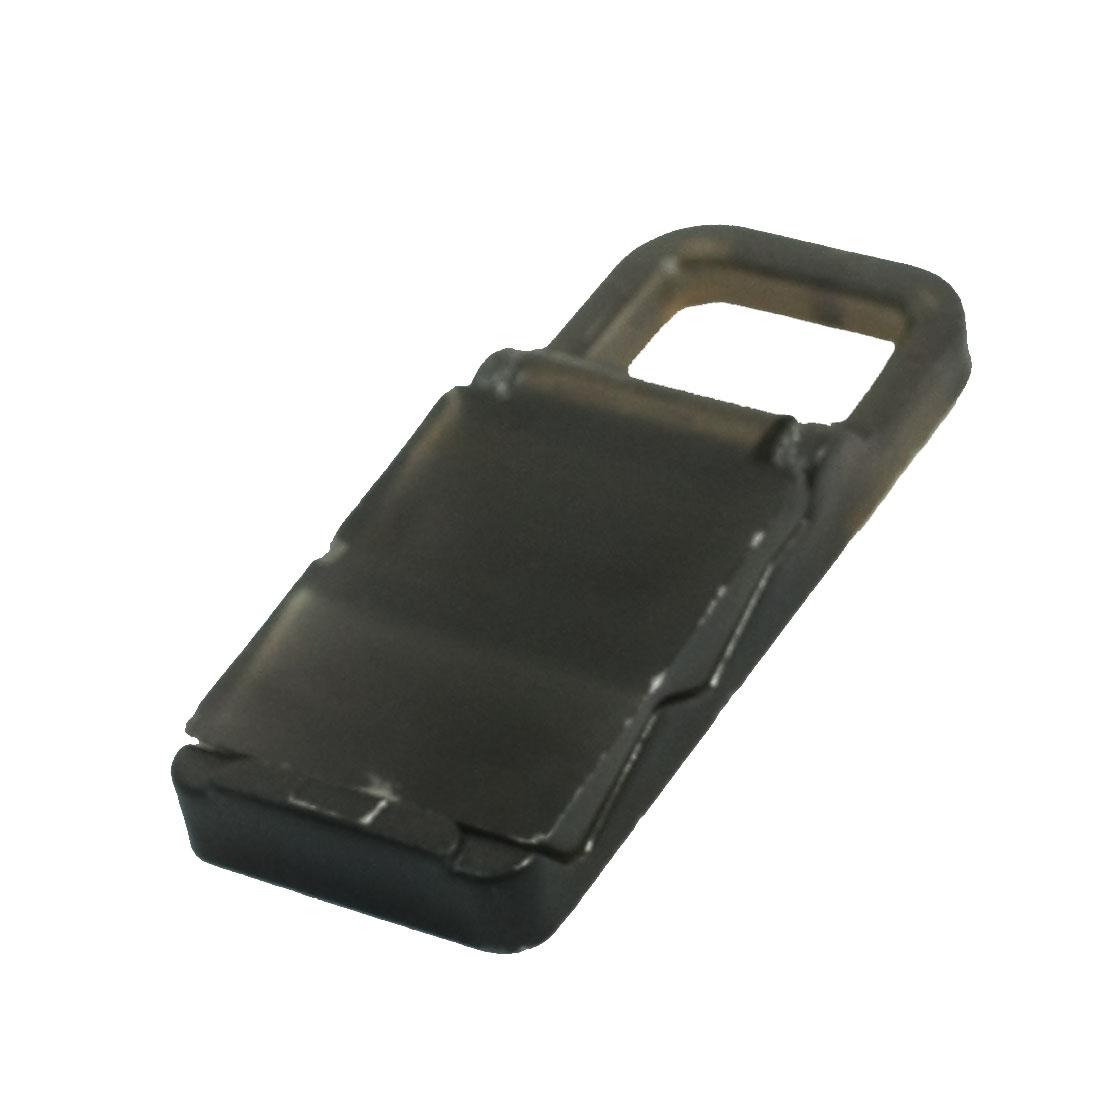 Dark Semi Transparent Folding Cradle Holder Mini Stand for IPhone